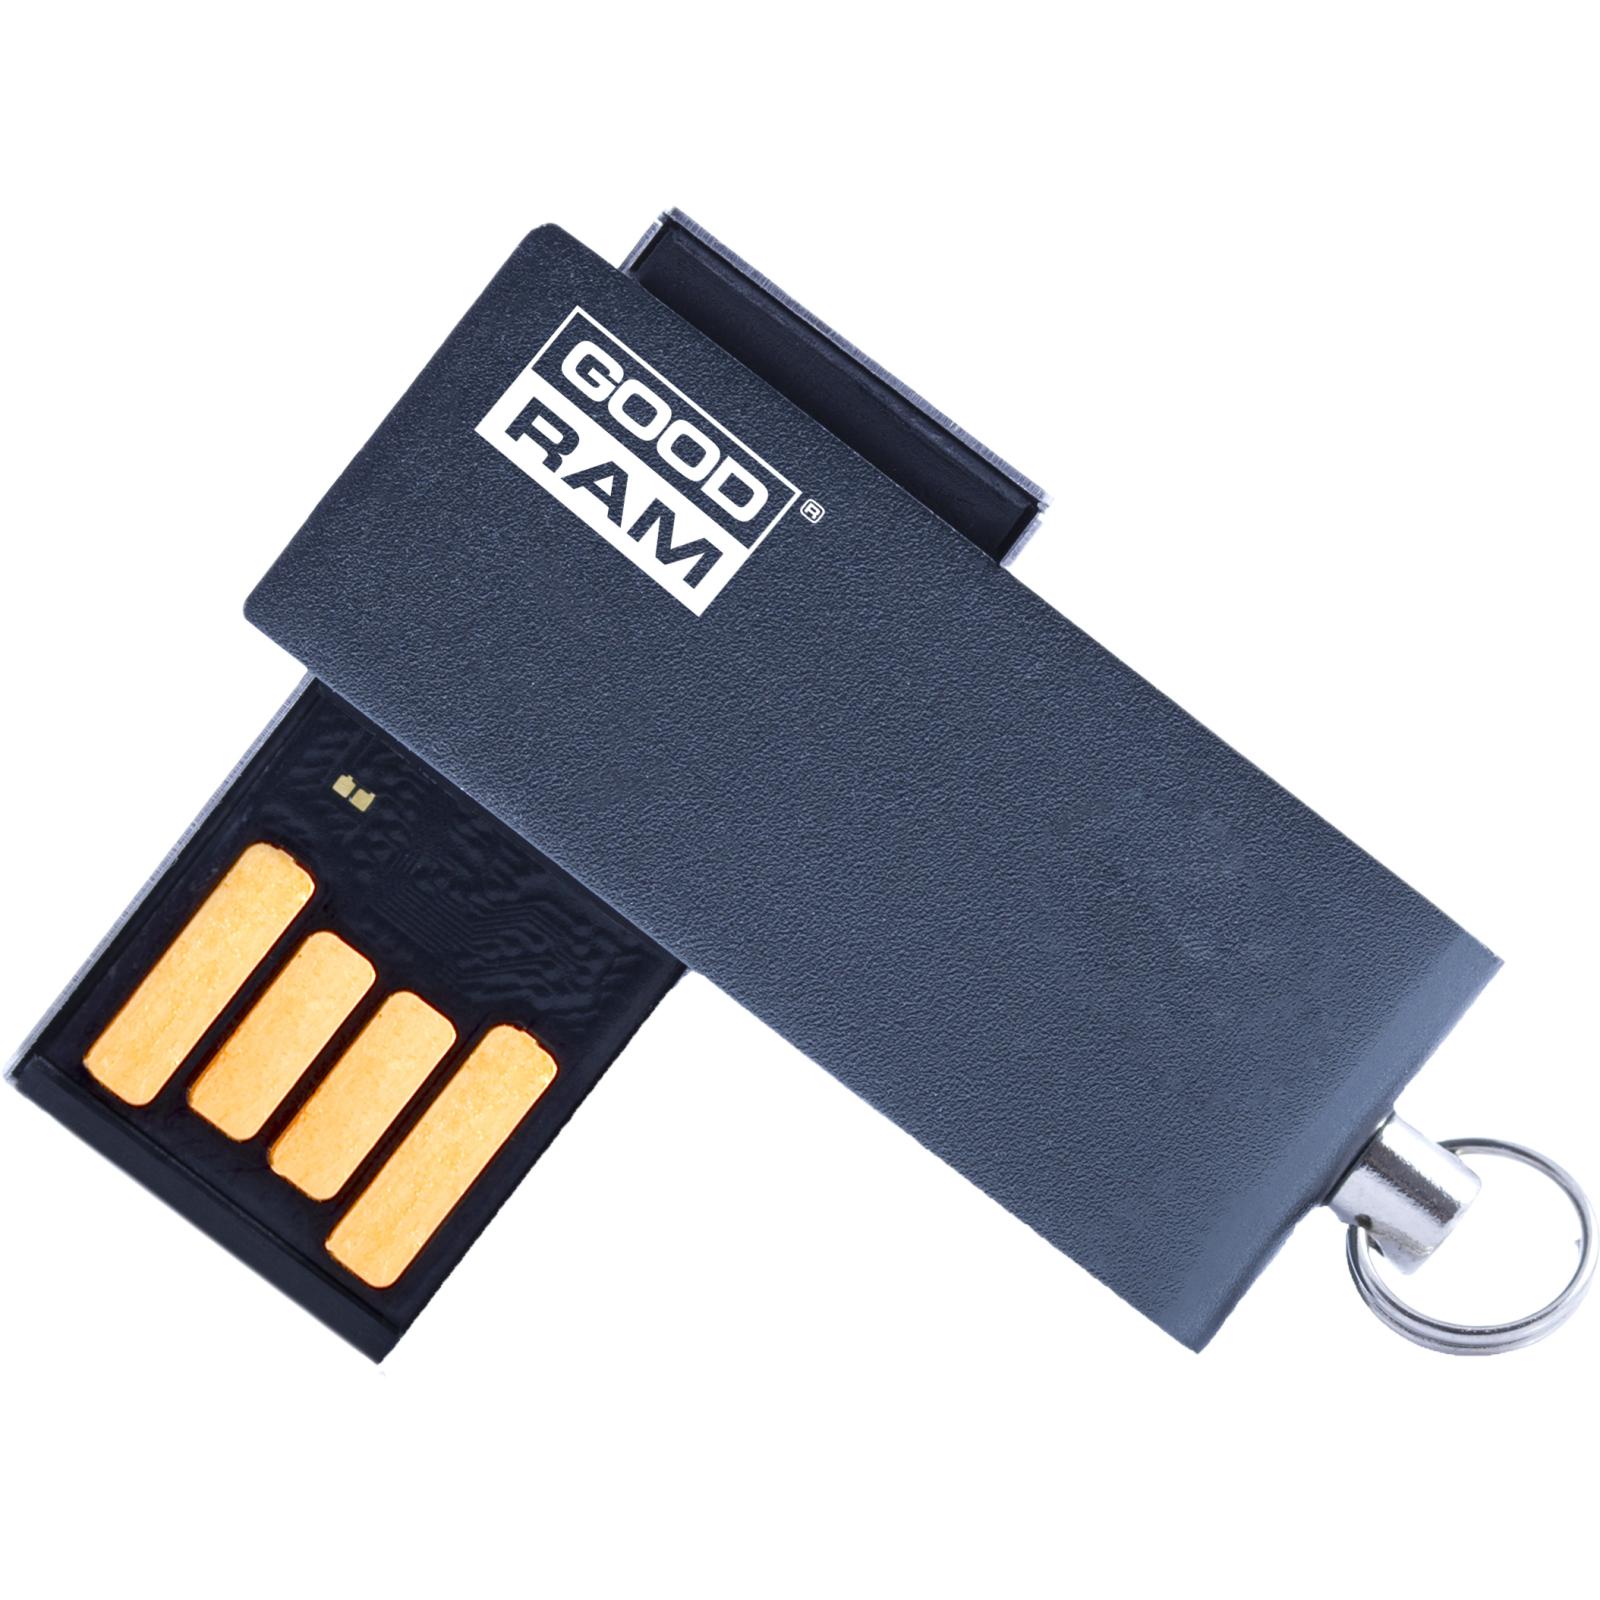 USB флеш накопитель Goodram 16GB Cube Black USB 2.0 (UCU2-0160K0R11)